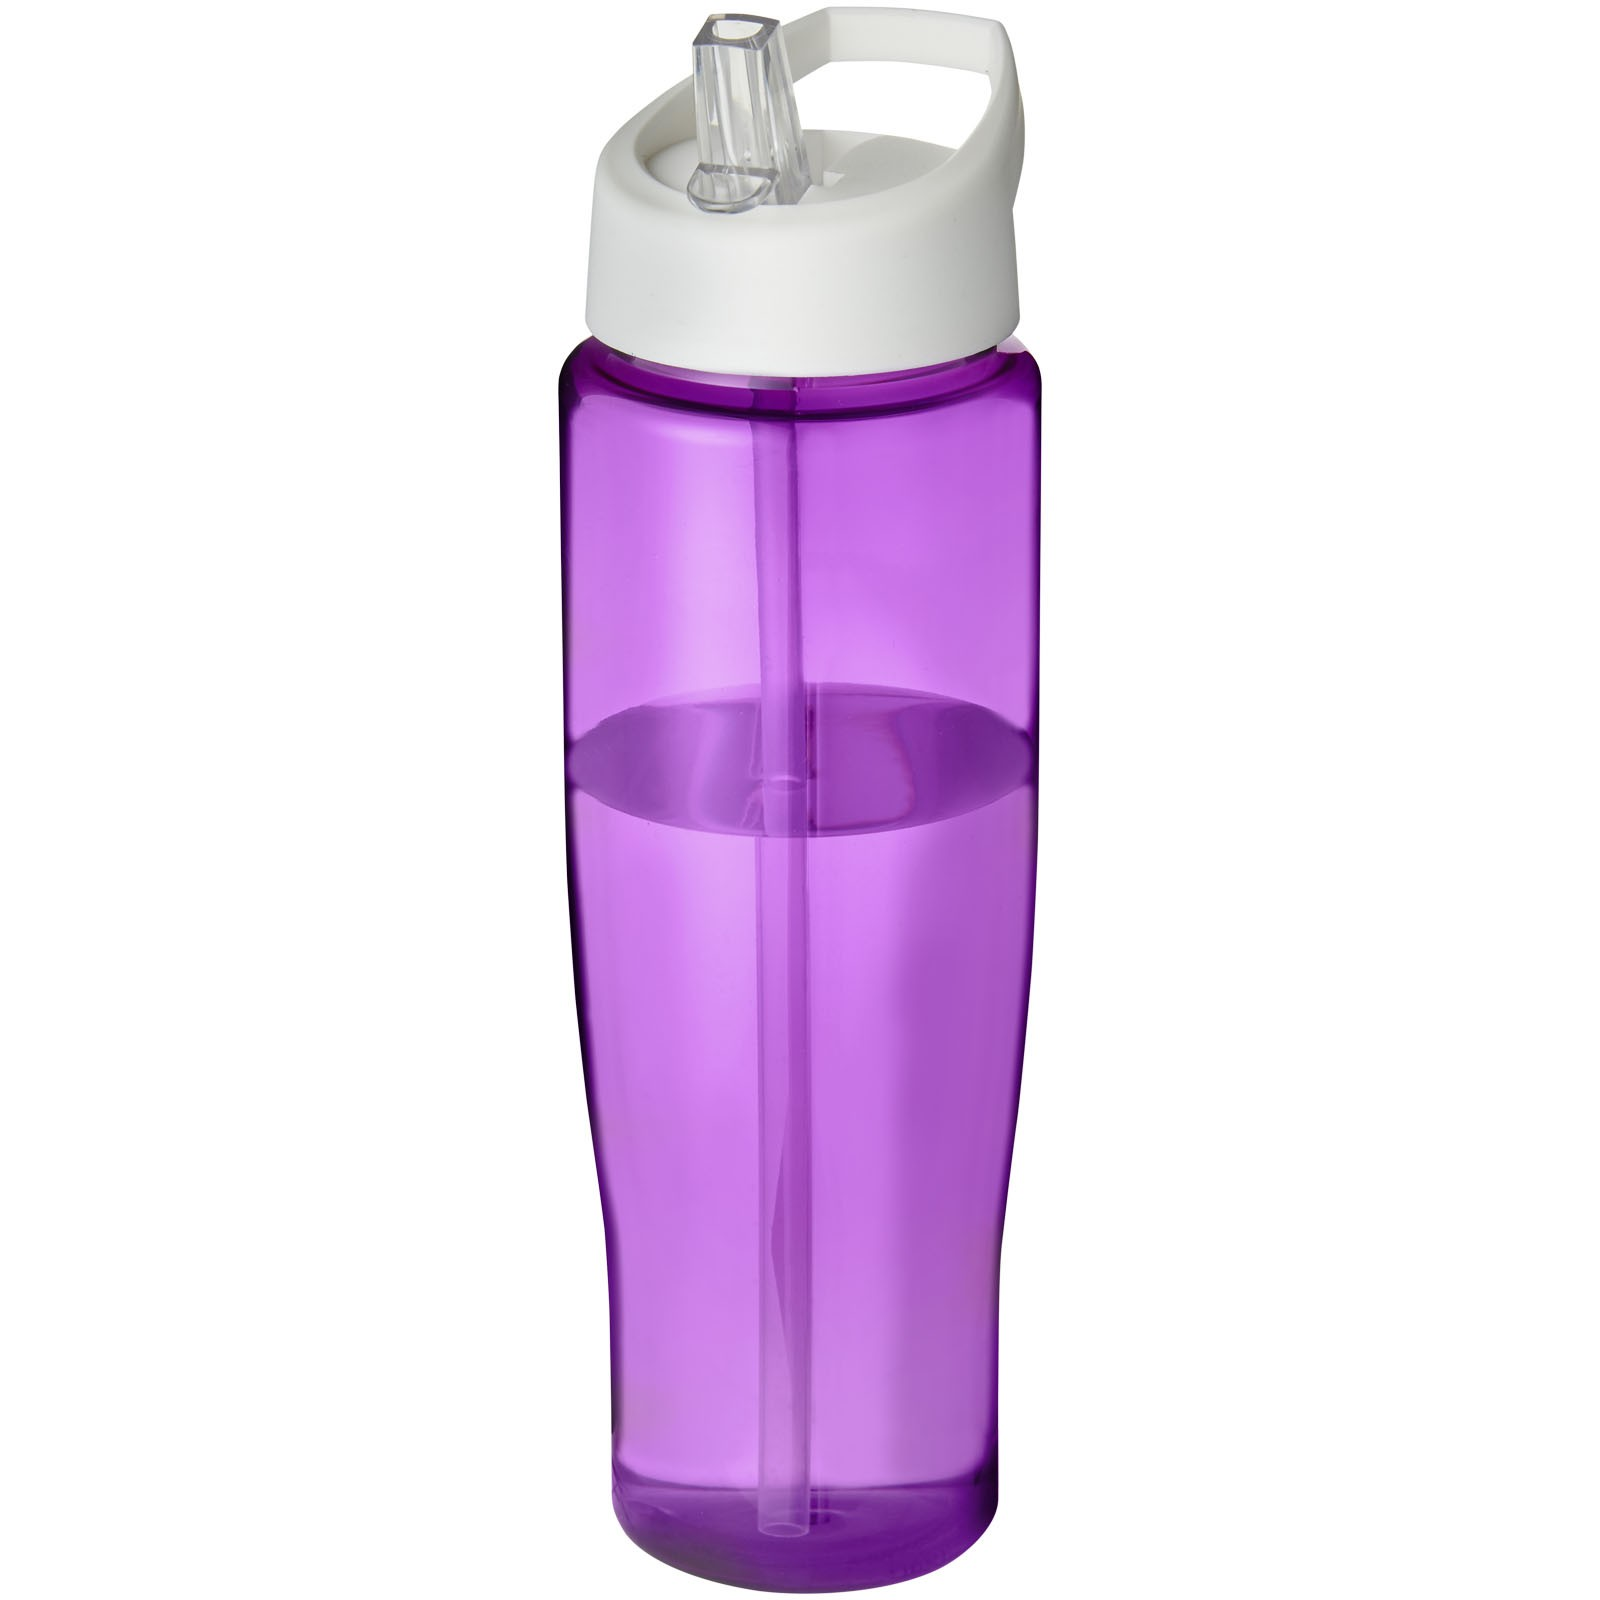 Sportovní láhev s víčkem s hubičkou H2O Tempo® 700 ml - Purpurová / Bílá